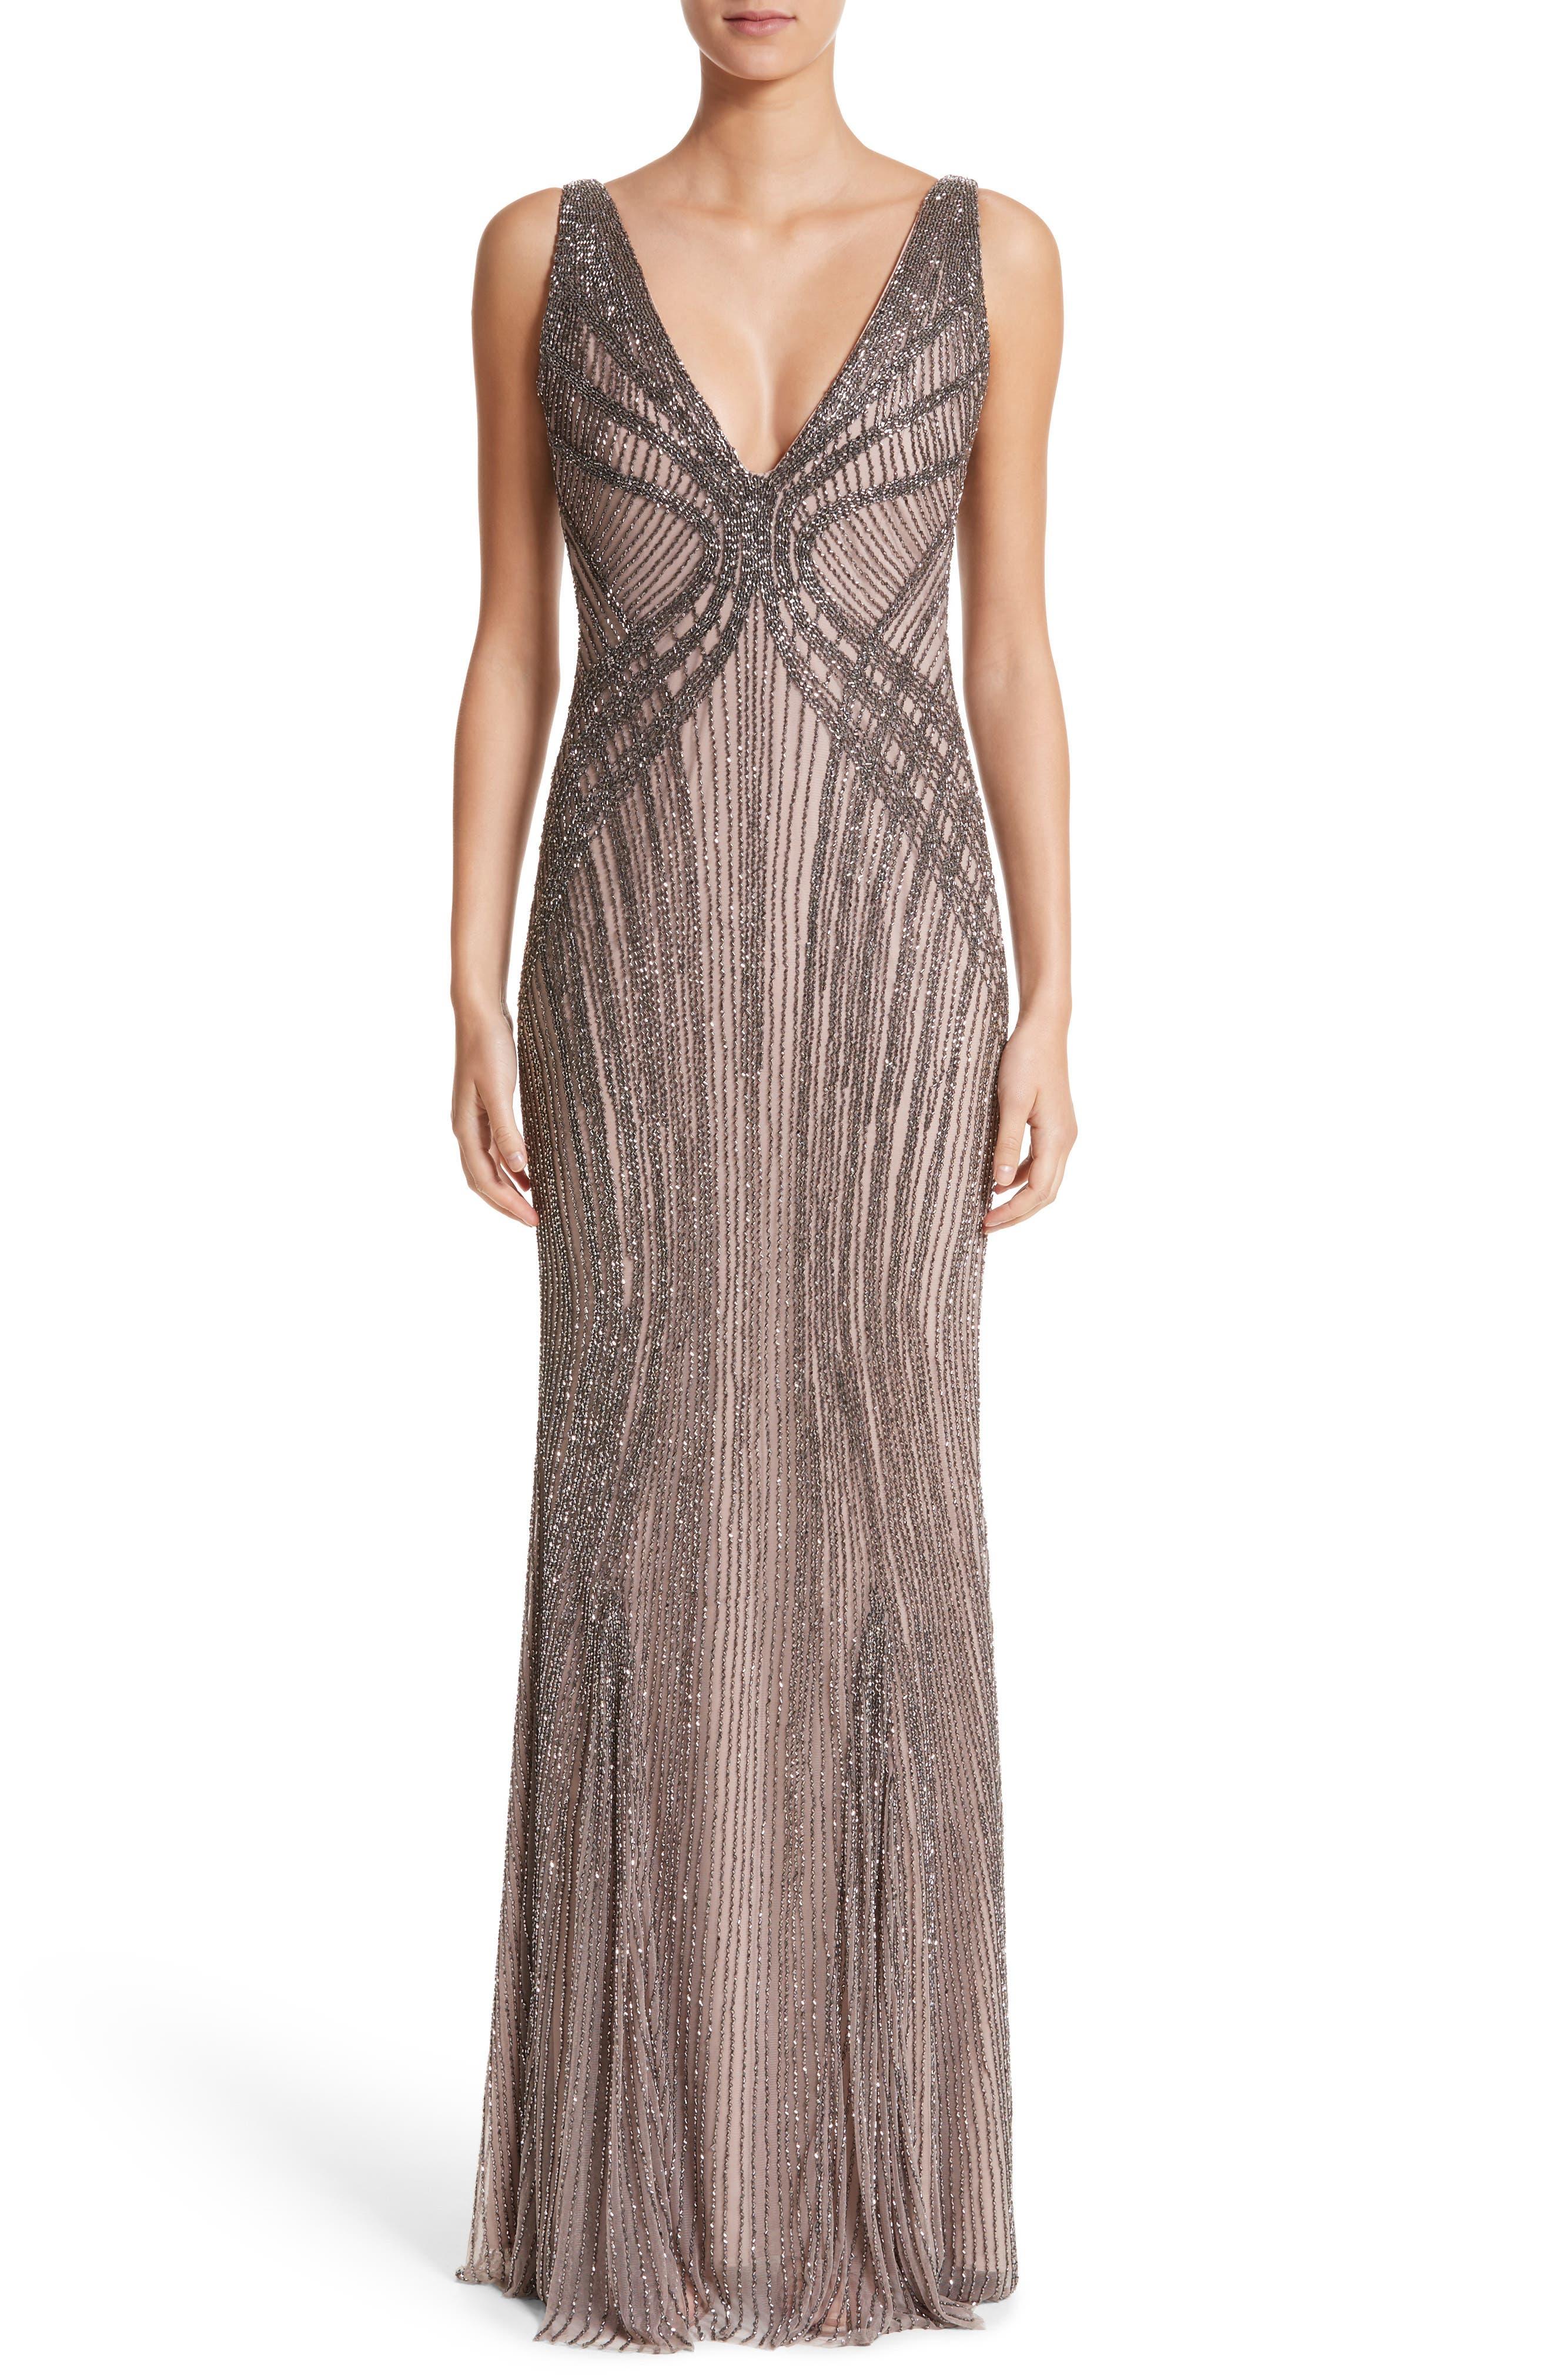 Rachel Gilbert Hand Embellished V-Neck Gown